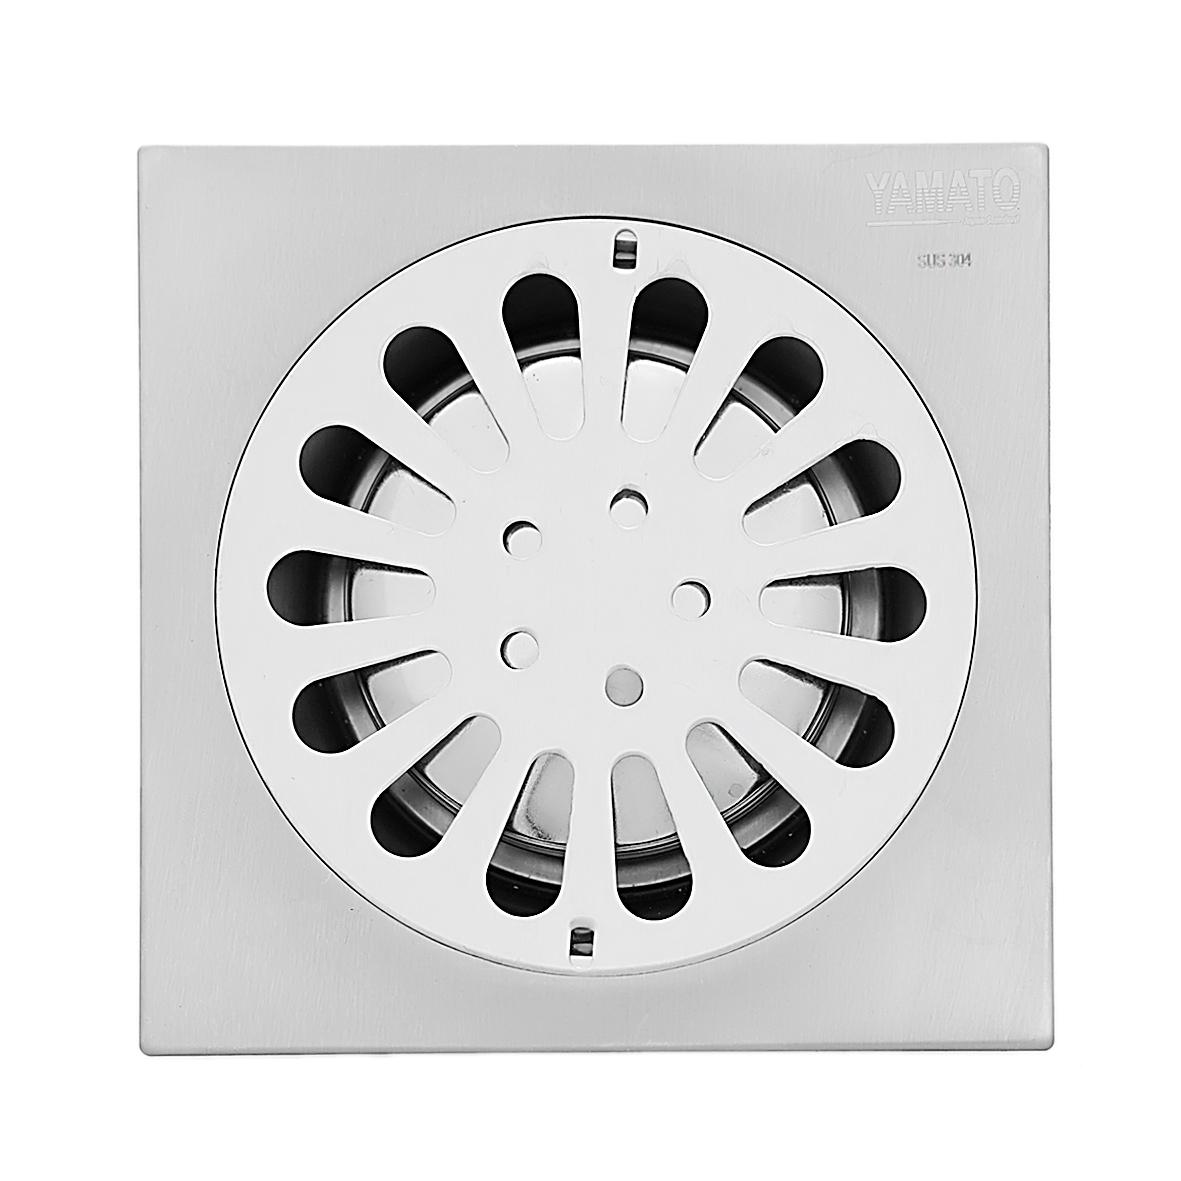 Hố ga thoát sàn Inox 304 (120x120)mm